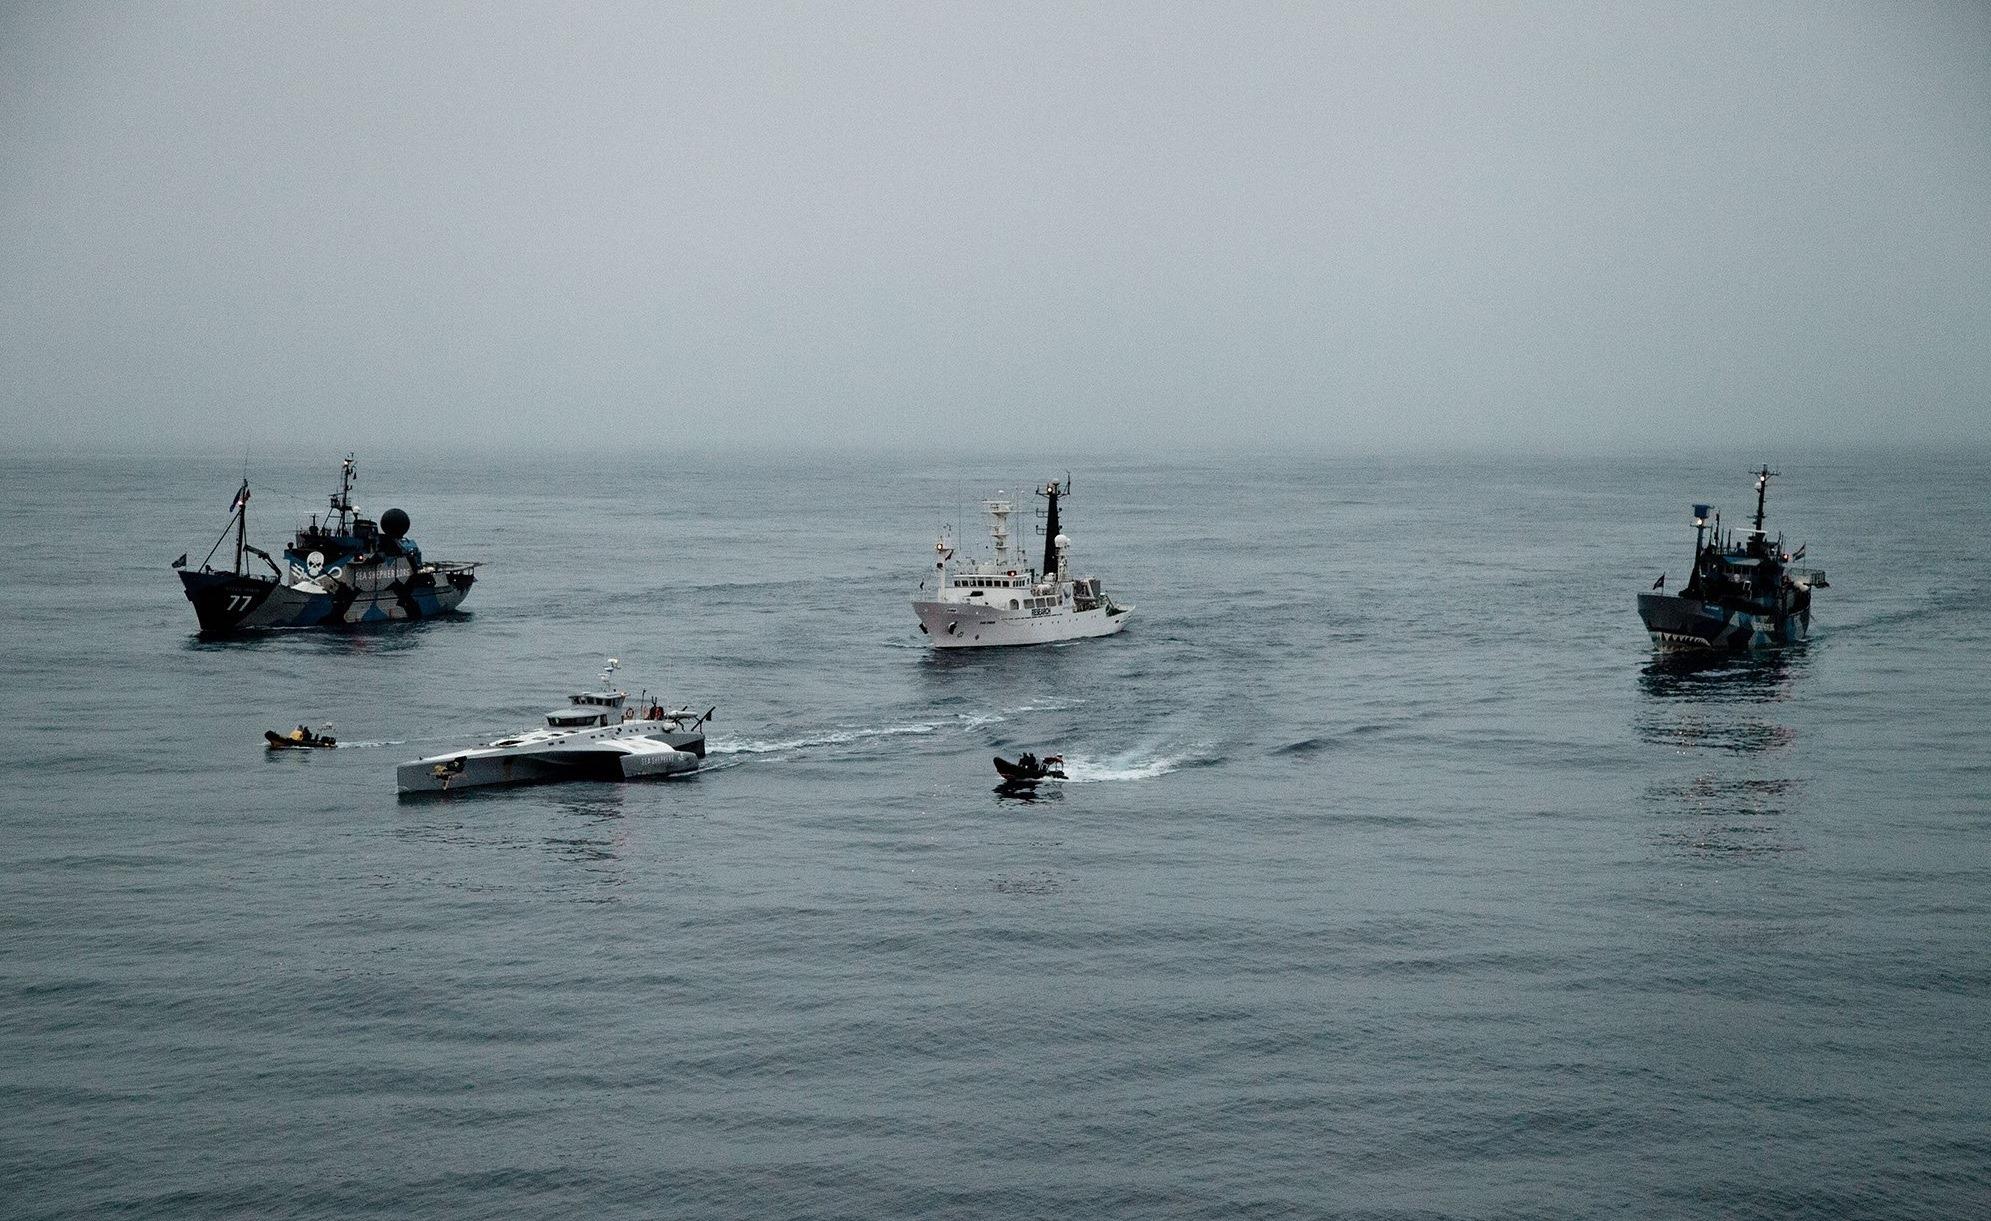 sea shepherd_1.jpg